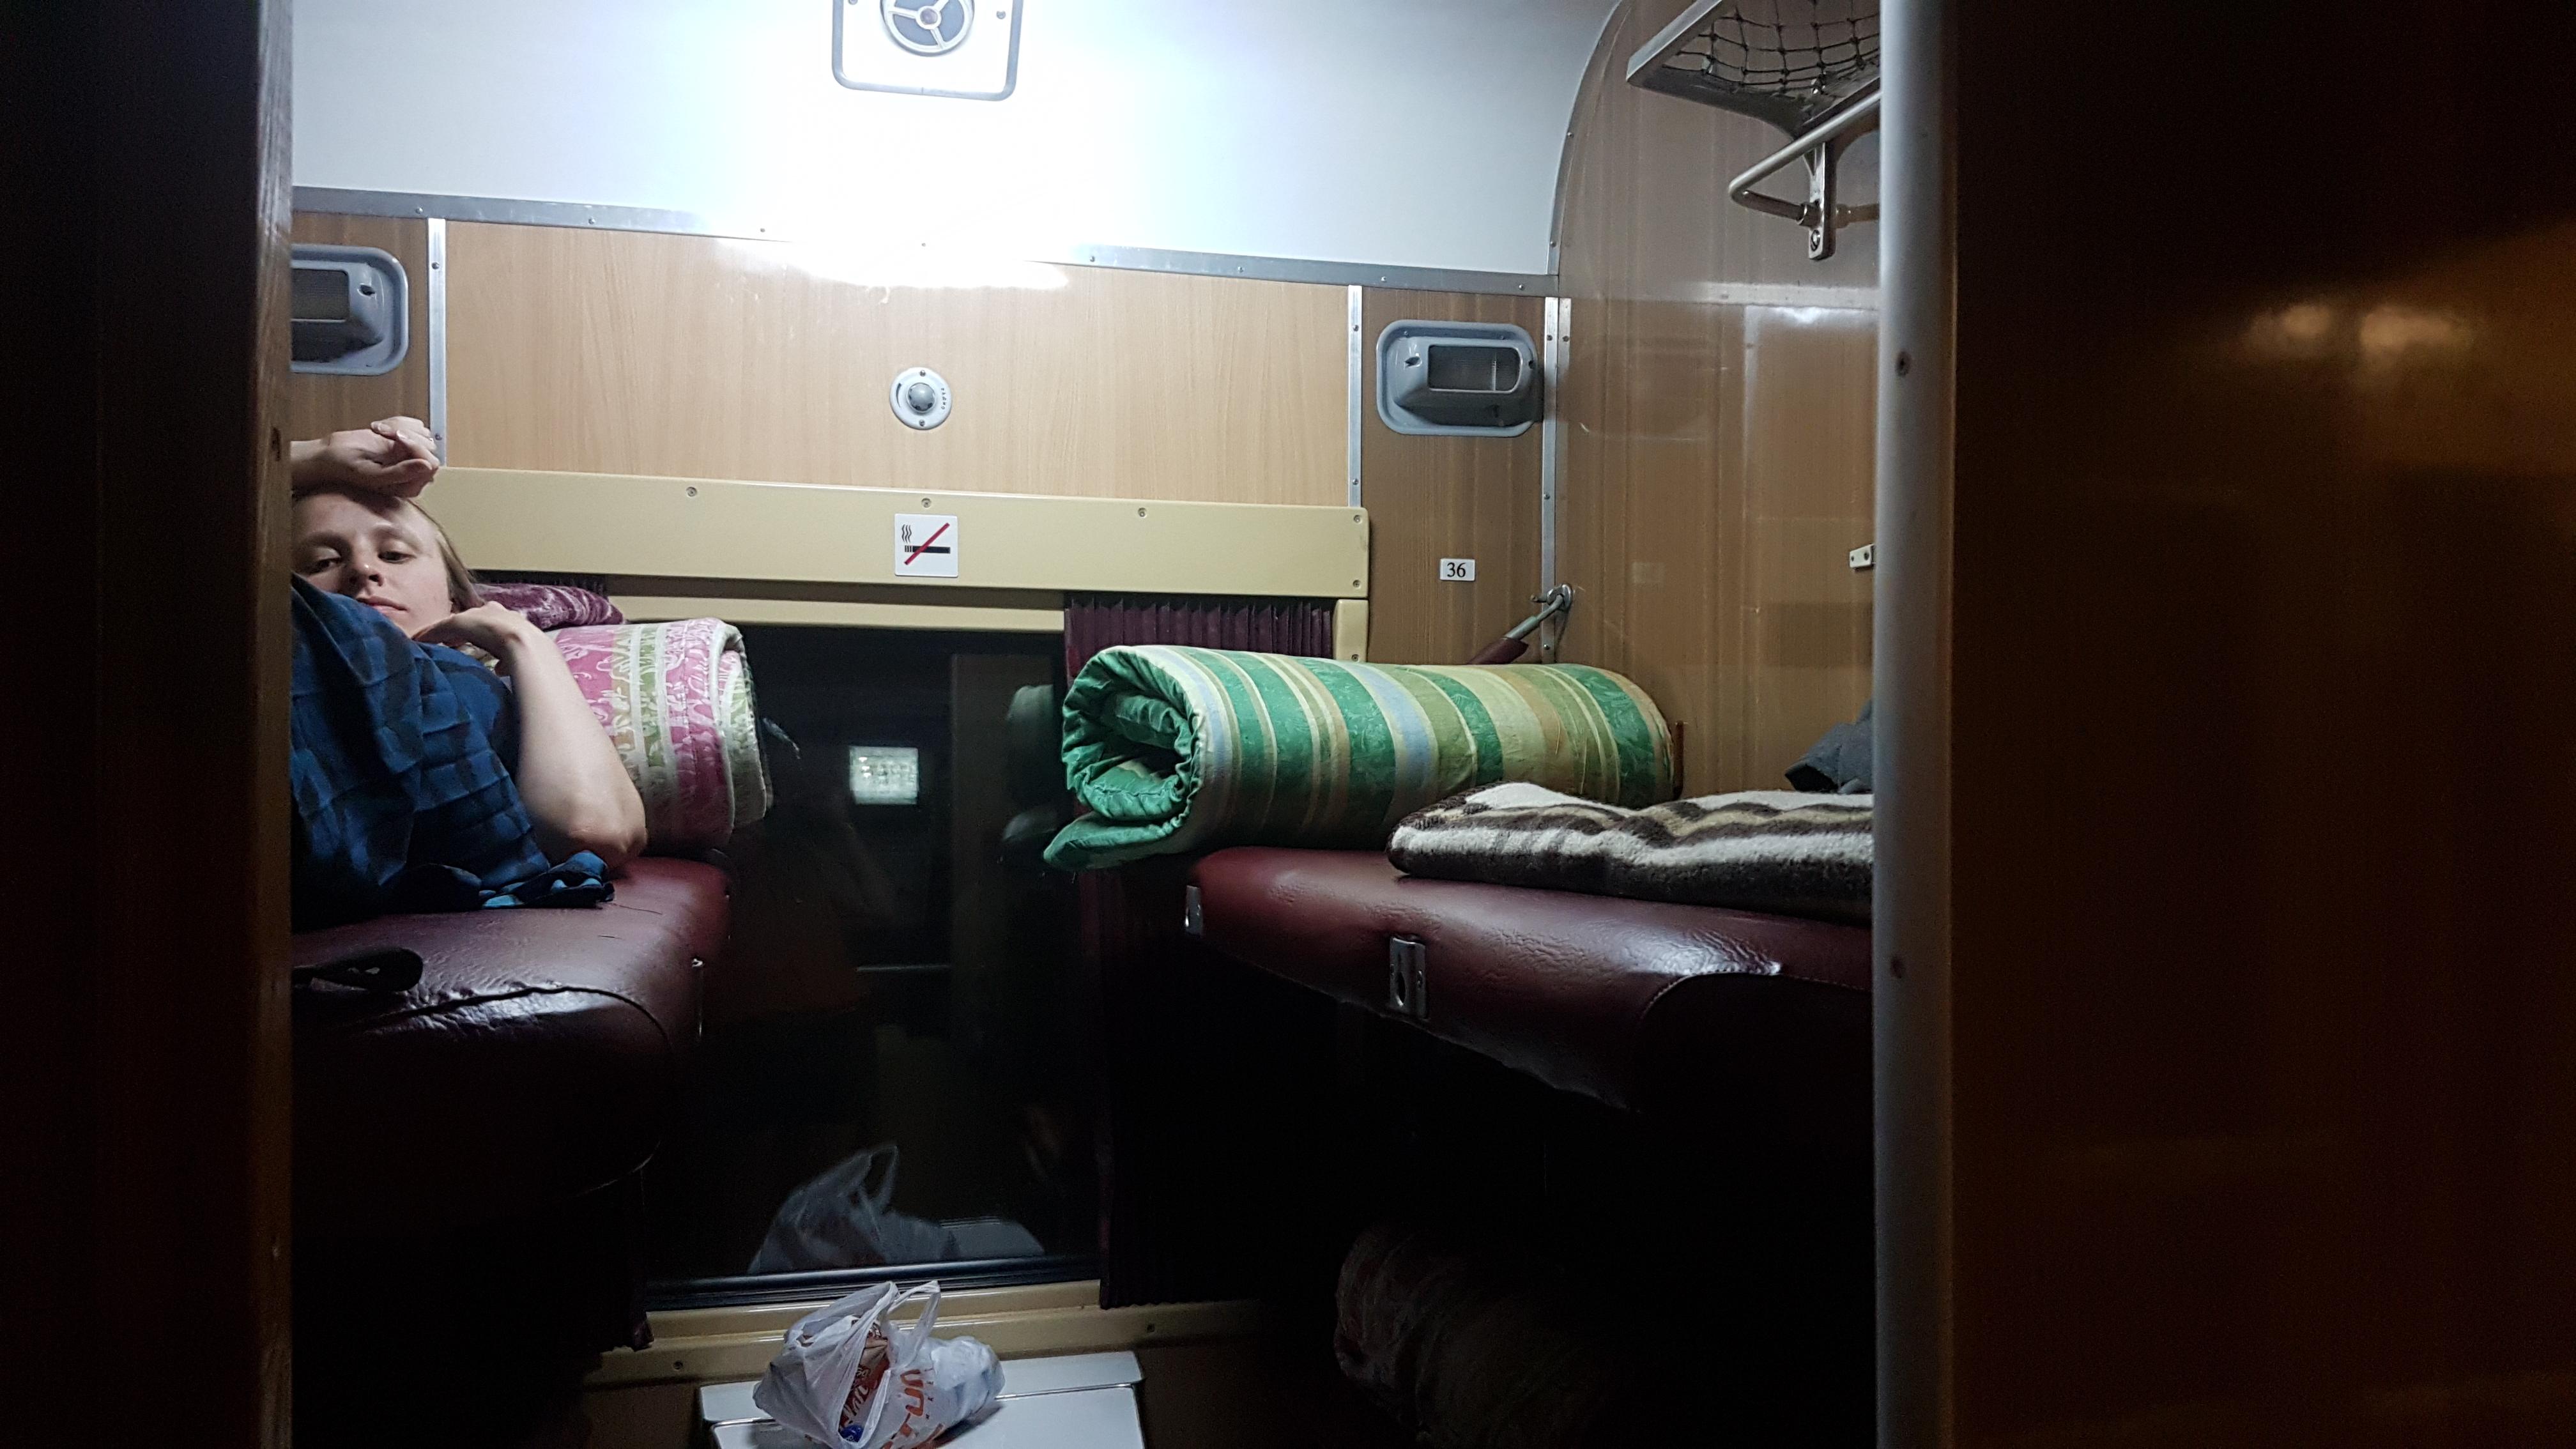 Sleeper Train from Baku to Balakan | How to Get From Baku to Georgia